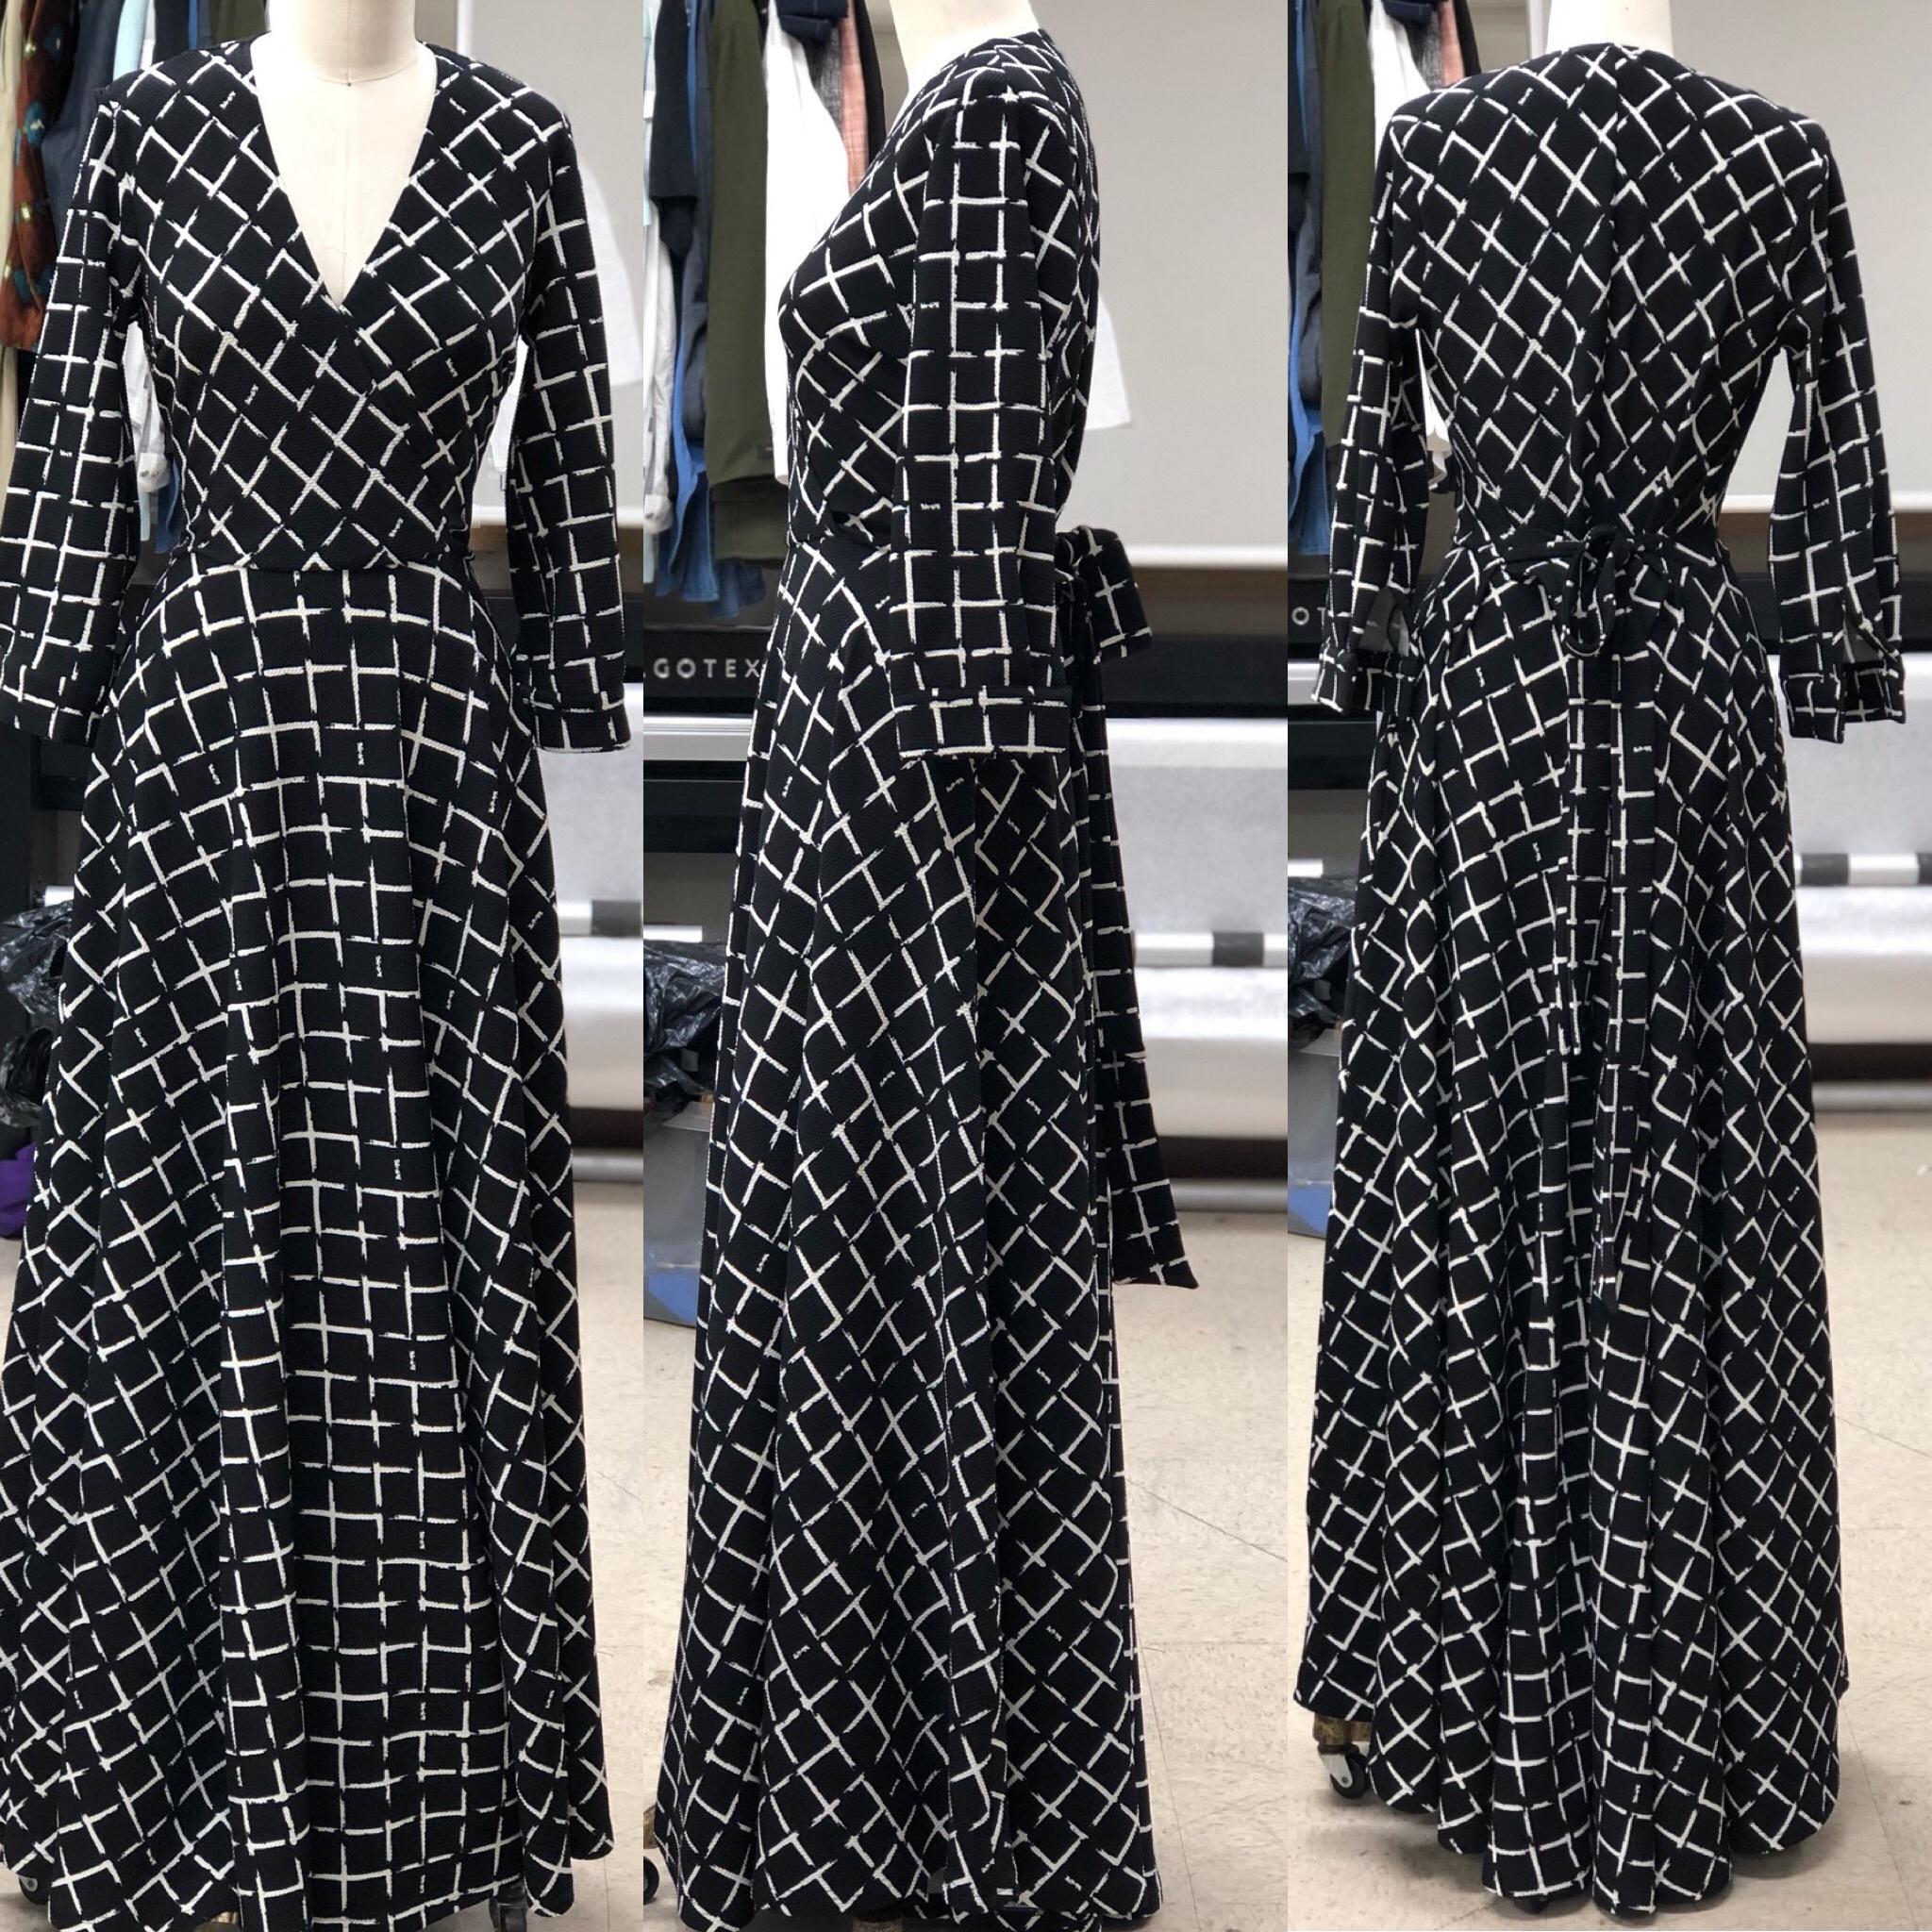 """2019"" Spring/Summer Dress Collection ""Victoria Dress"" fresh off the machine."